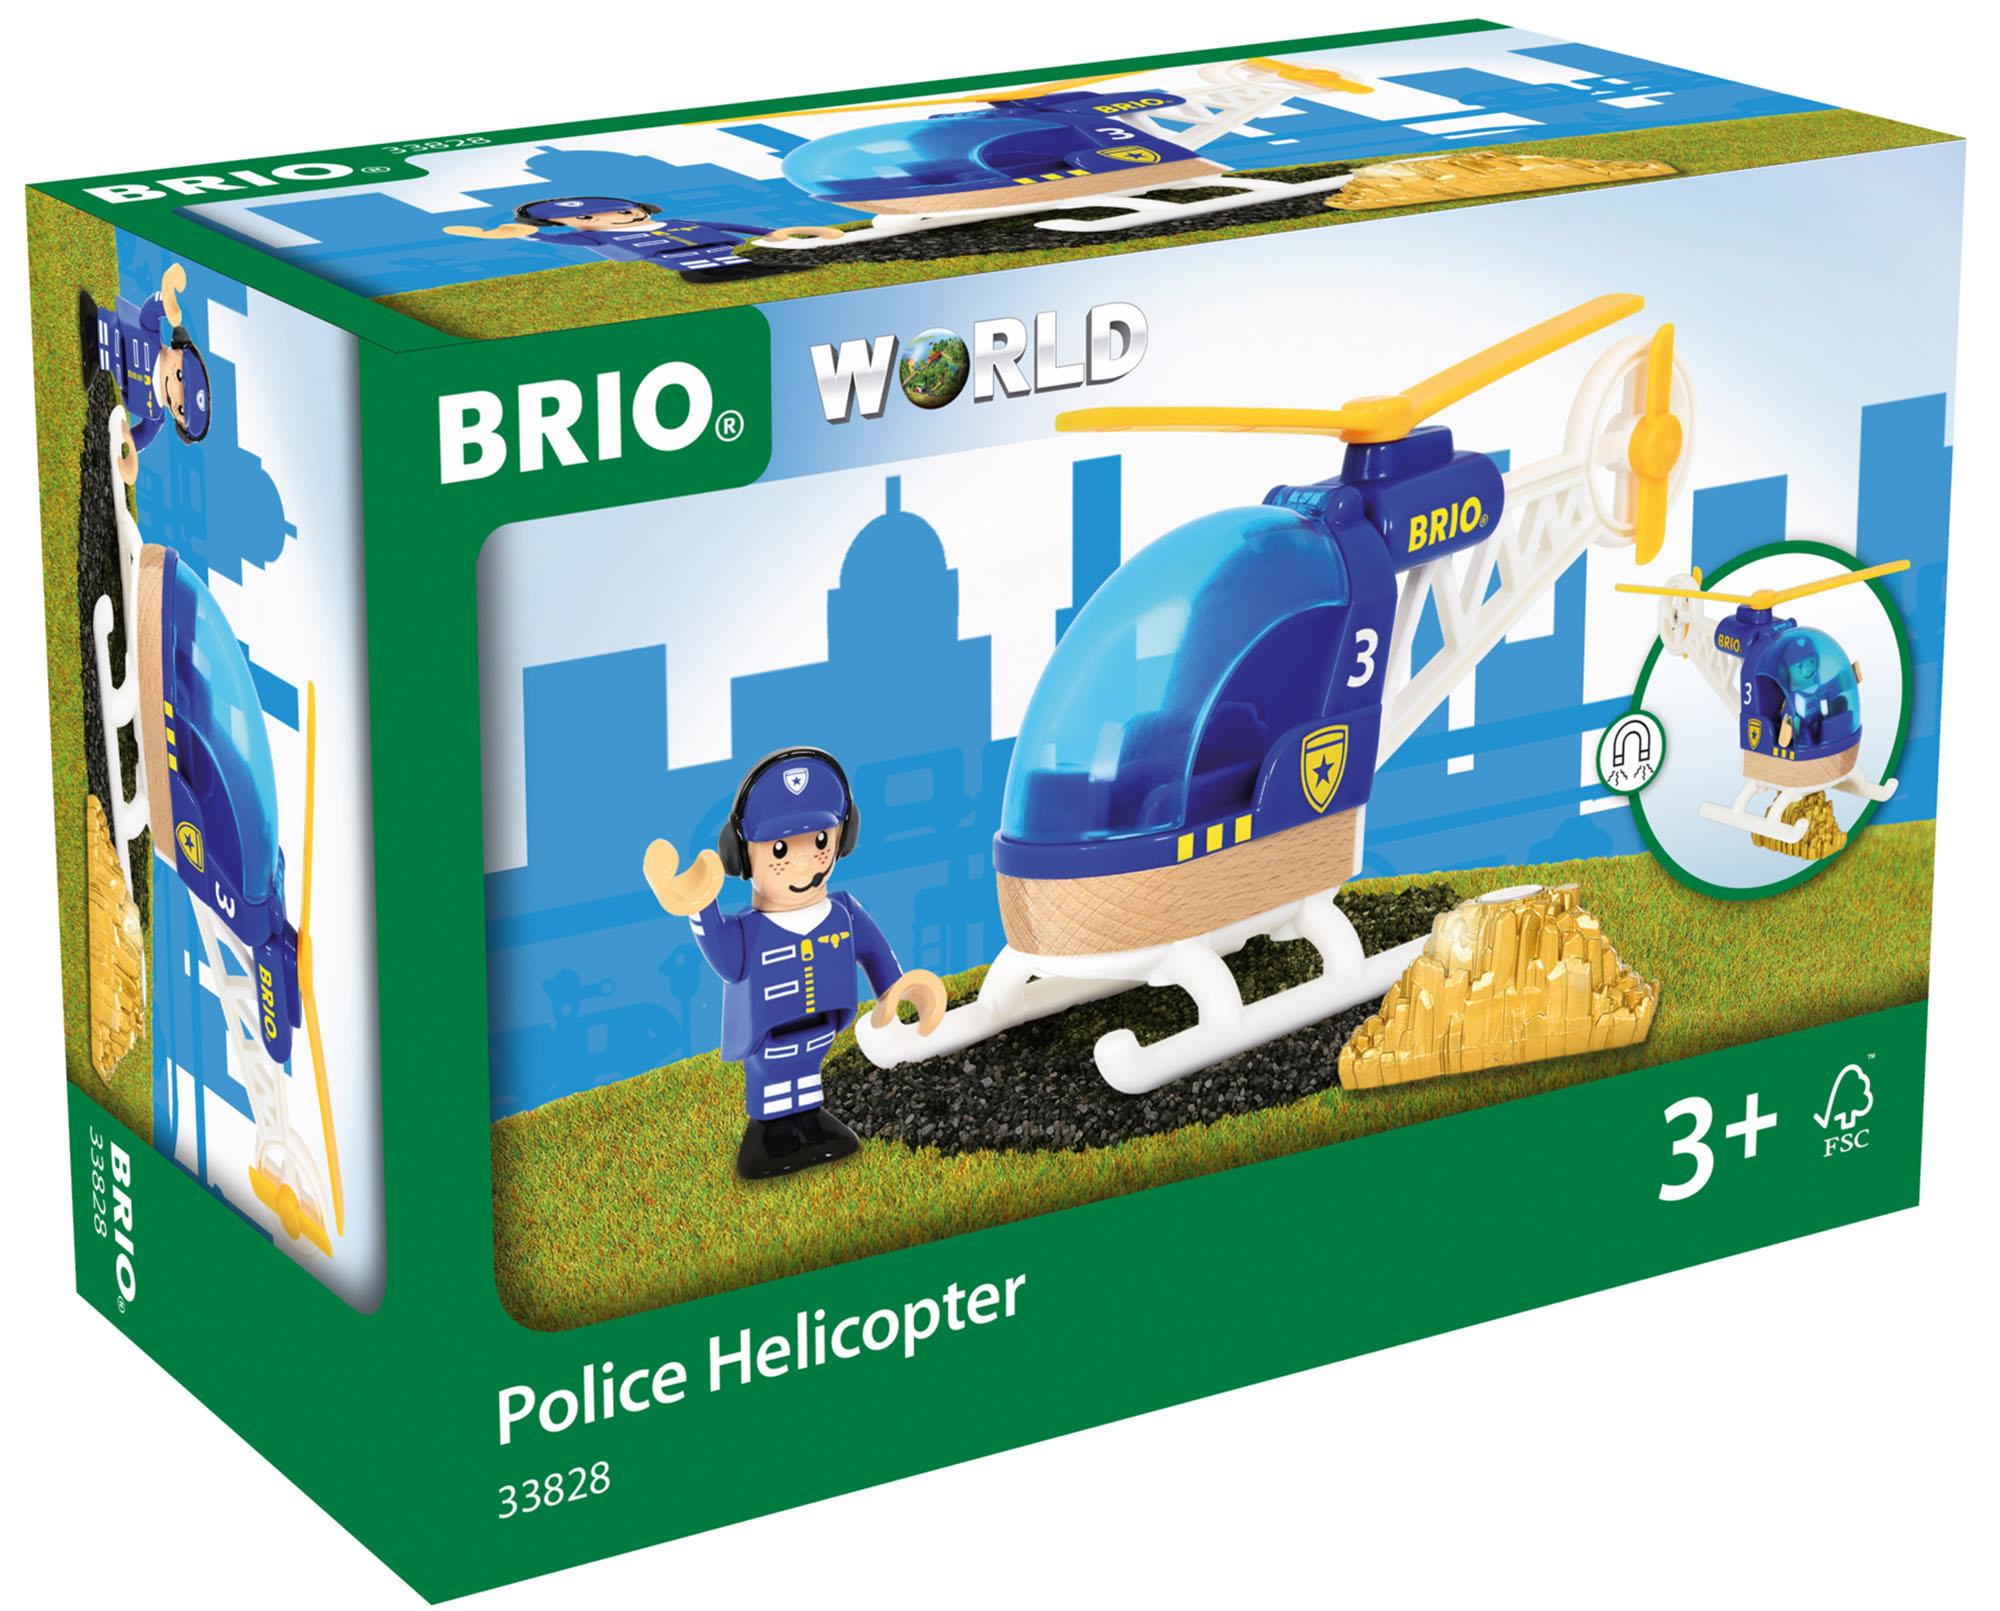 BRIO-Railway-Rolling-Stock-Full-Range-of-Wooden-Train-Rolling-Stock-Children-1yr thumbnail 43